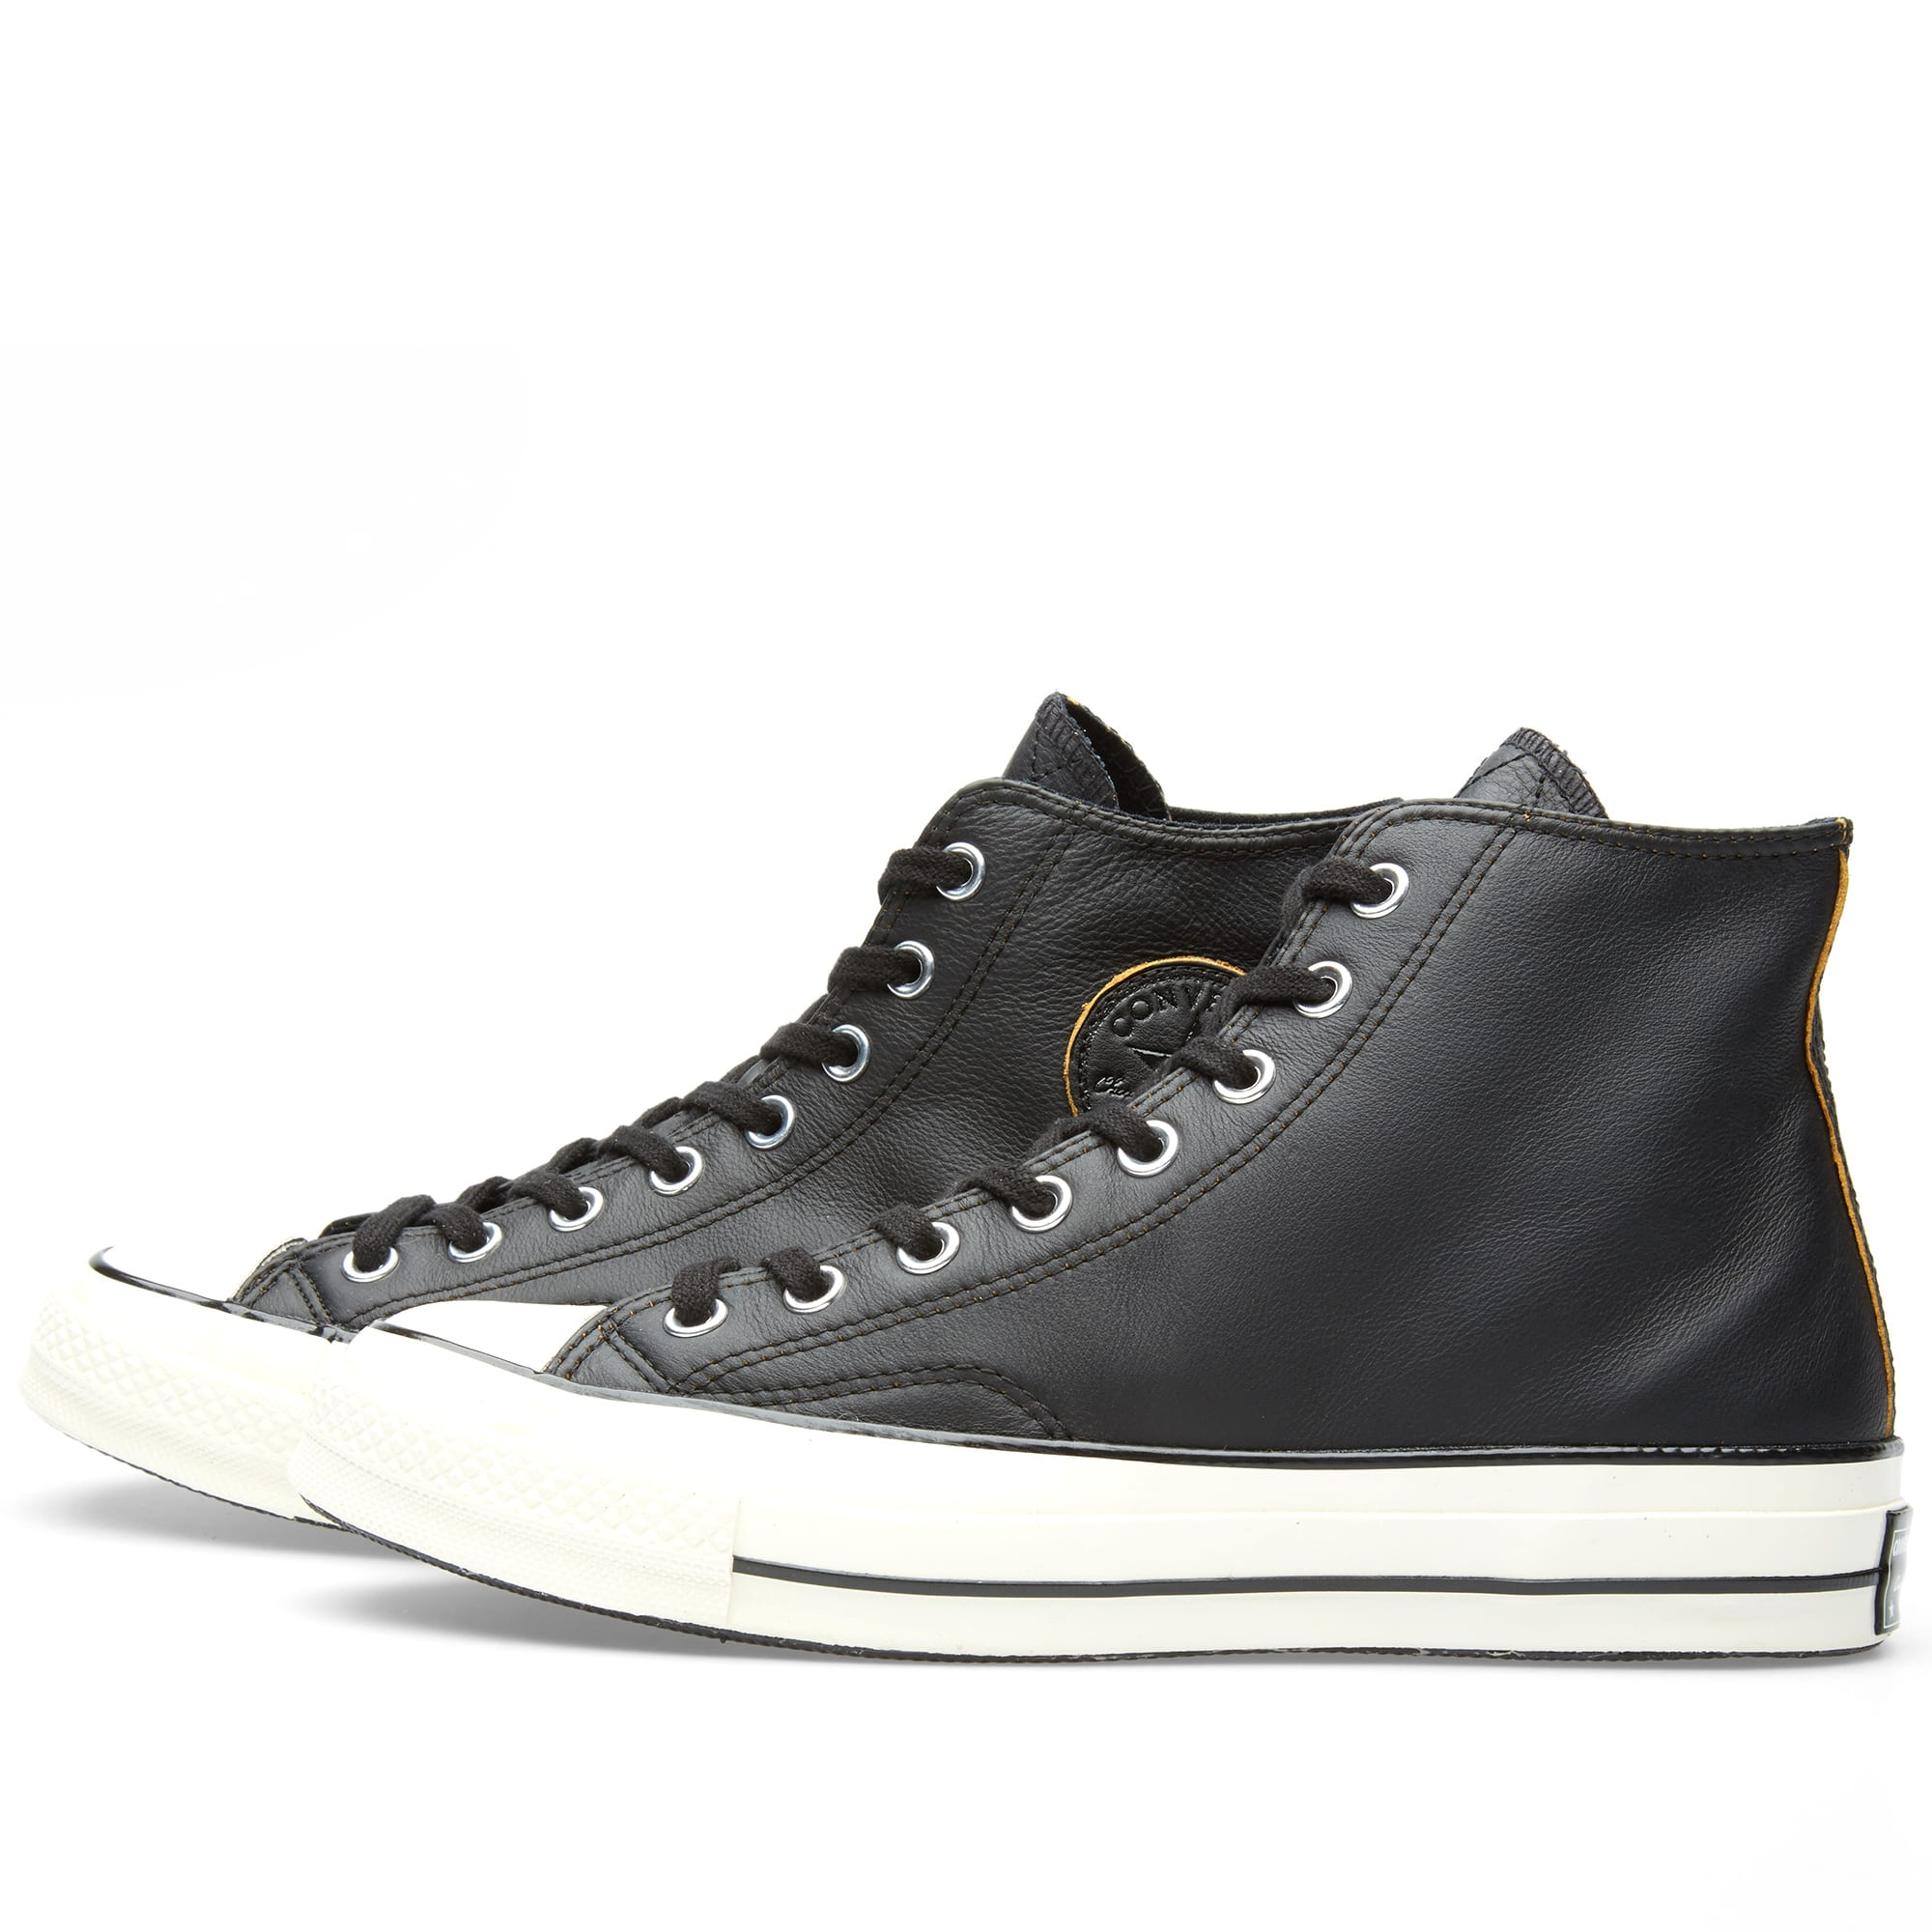 48f582786f1a7c Converse Chuck Taylor 1970s Hi Black Leather